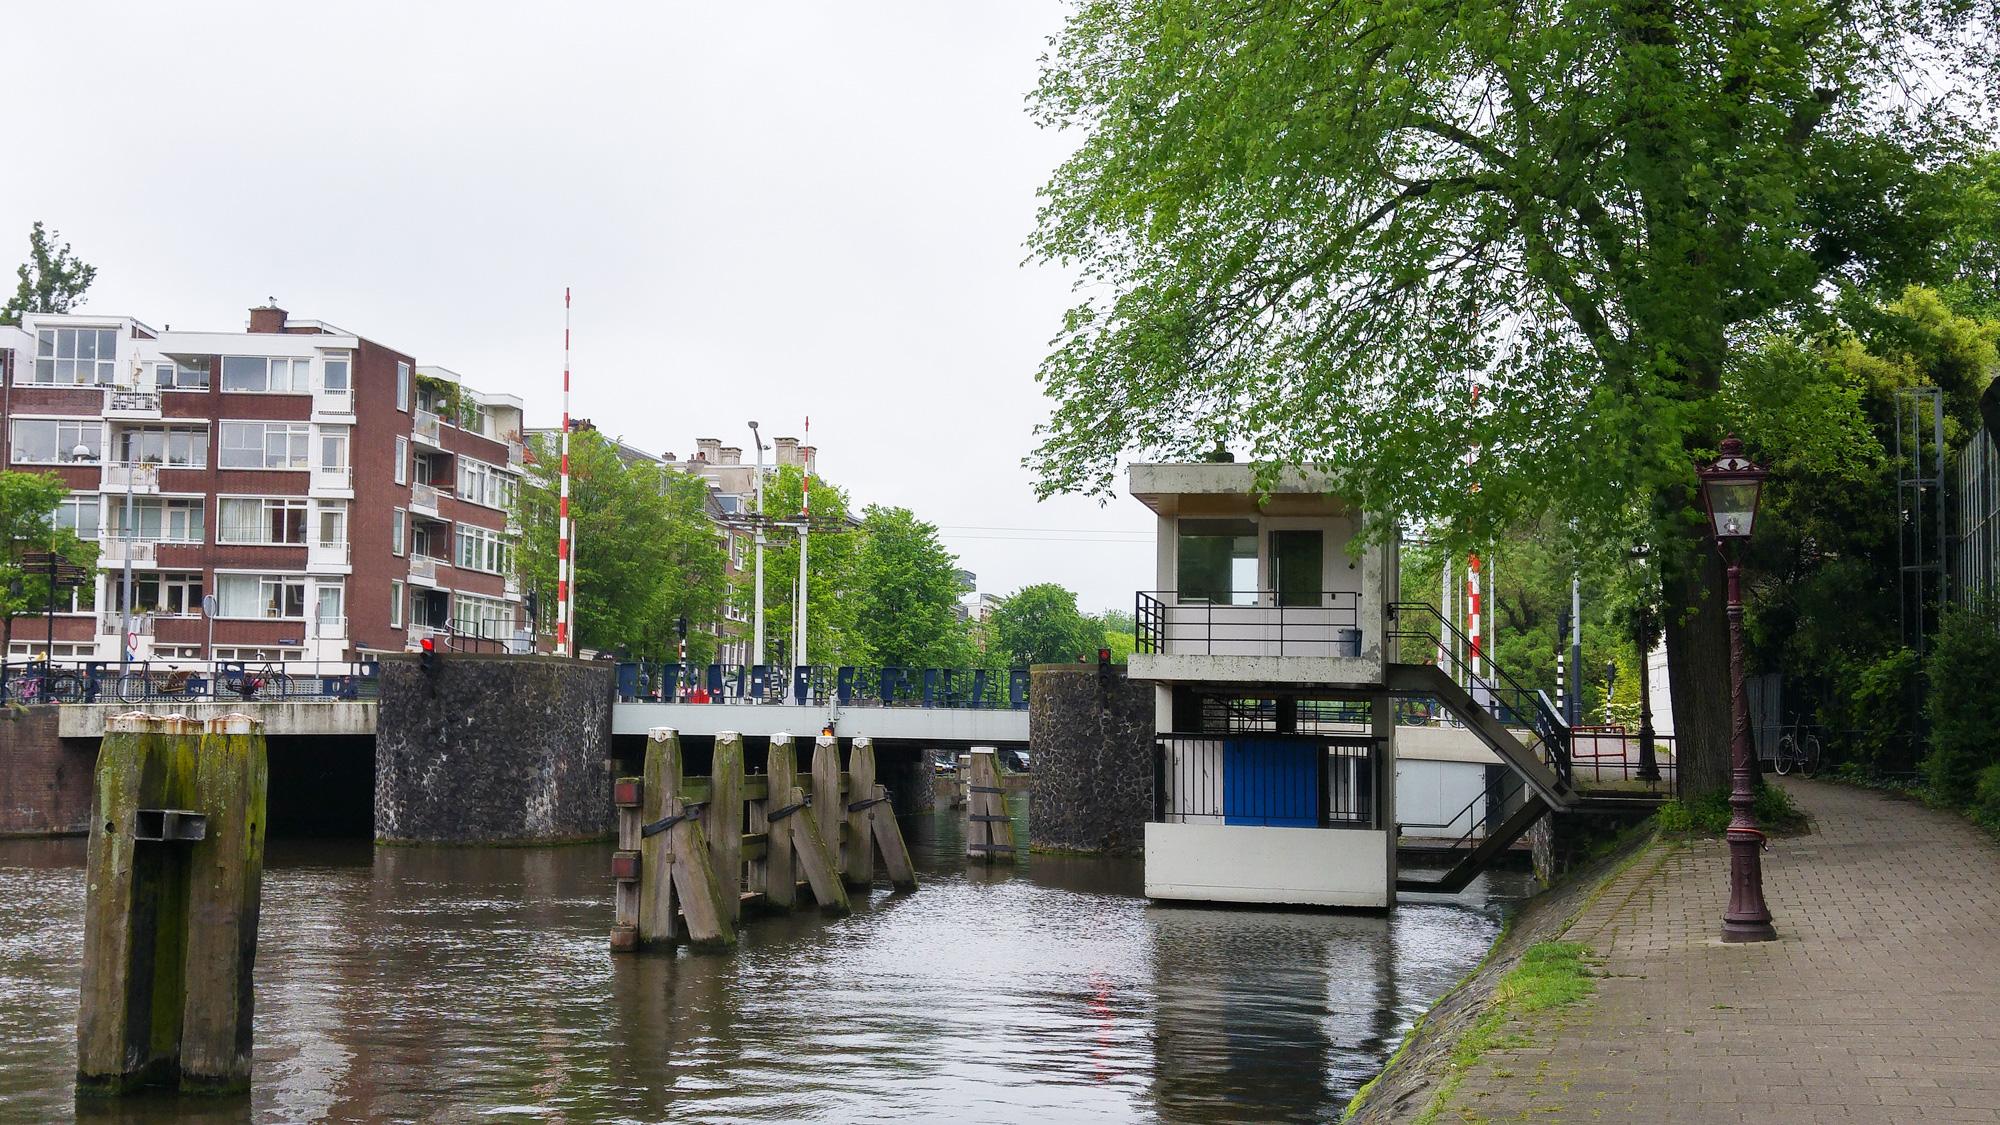 urbanbacklog-amsterdam-de-stijl-6.jpg